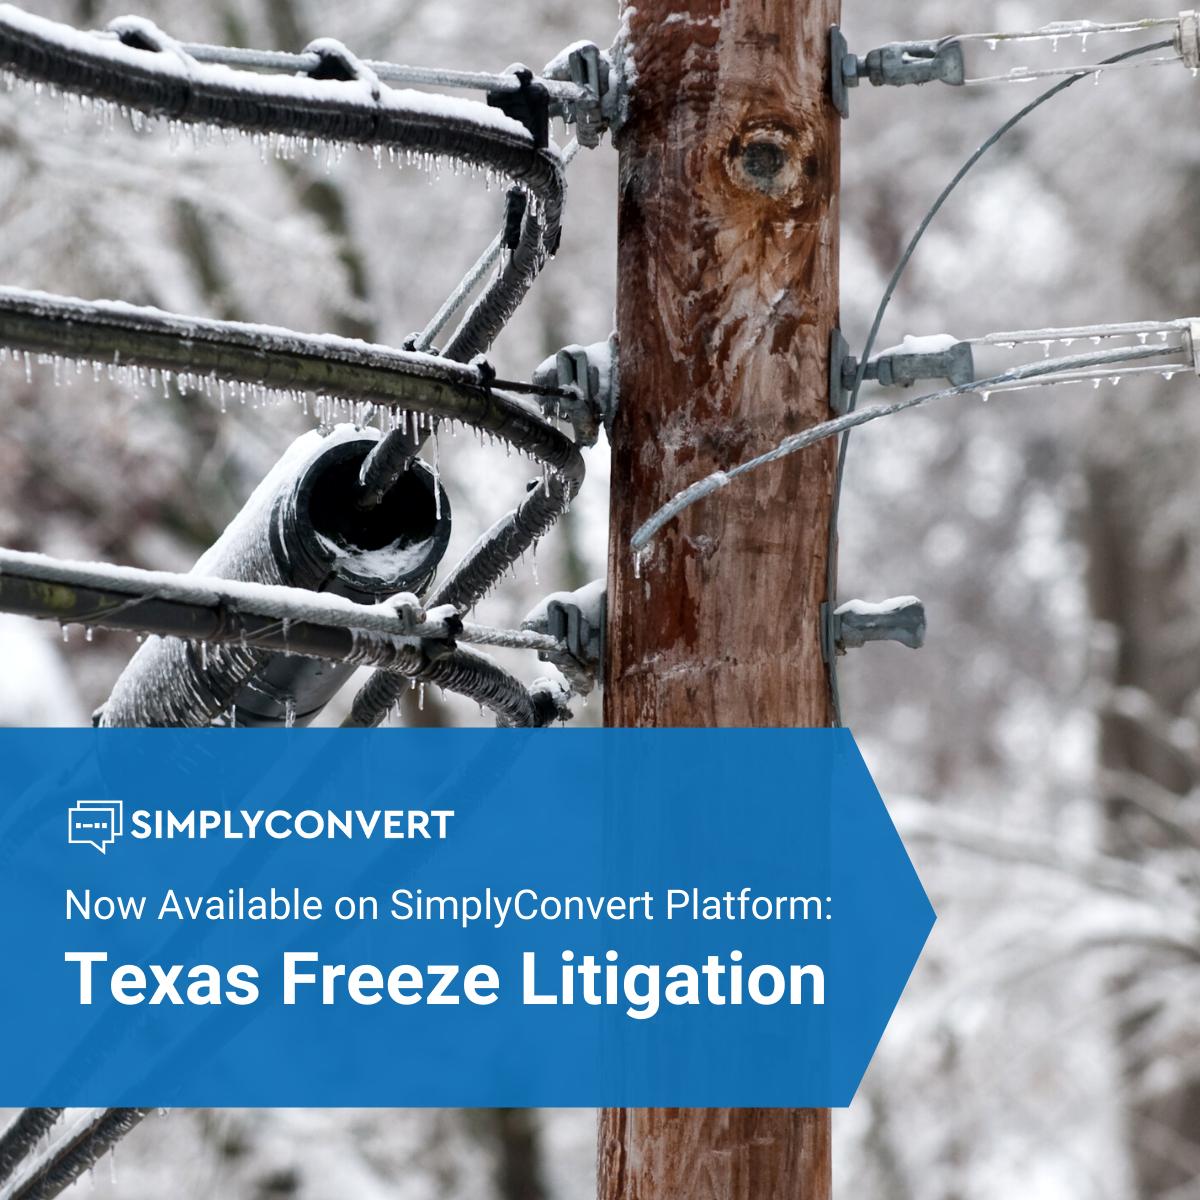 Texas Freeze Litigation